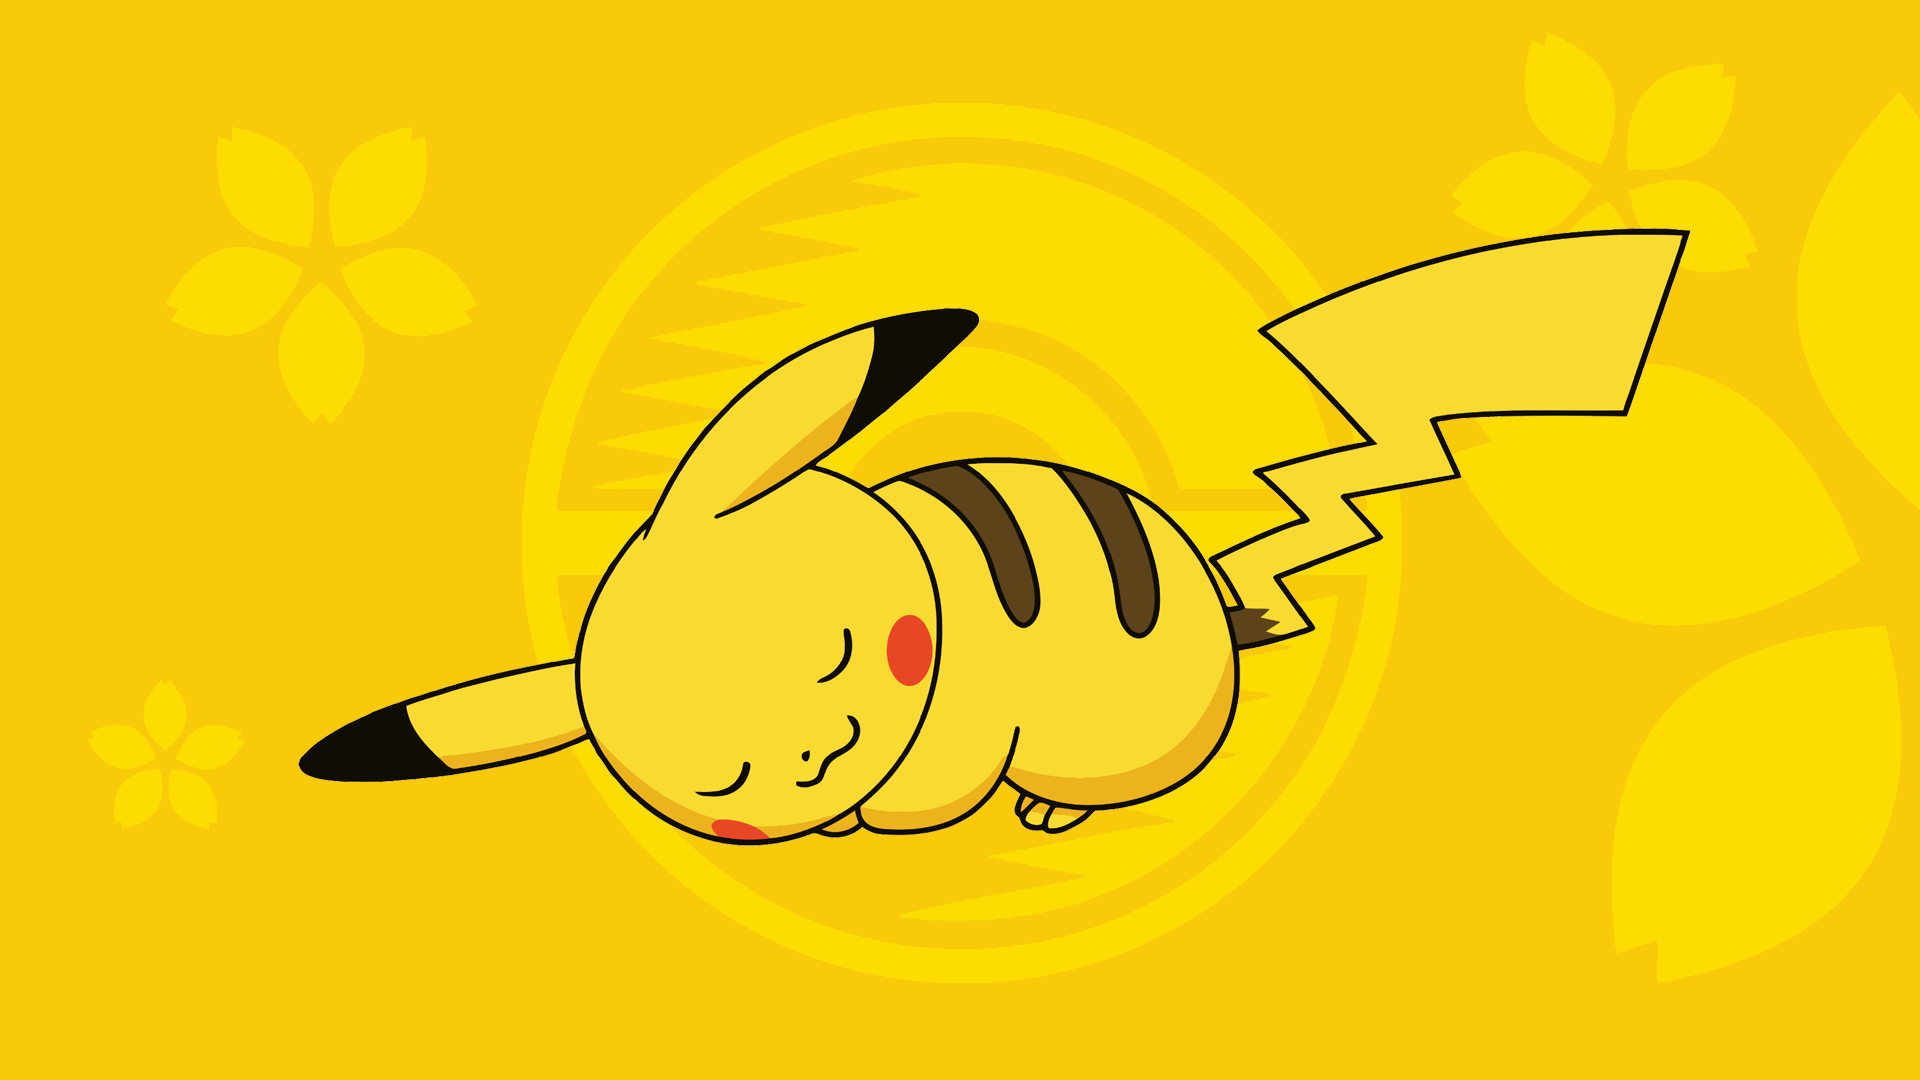 Wallpaper  Onemuri Pikachu by HonokawaPikachu Face Wallpaper